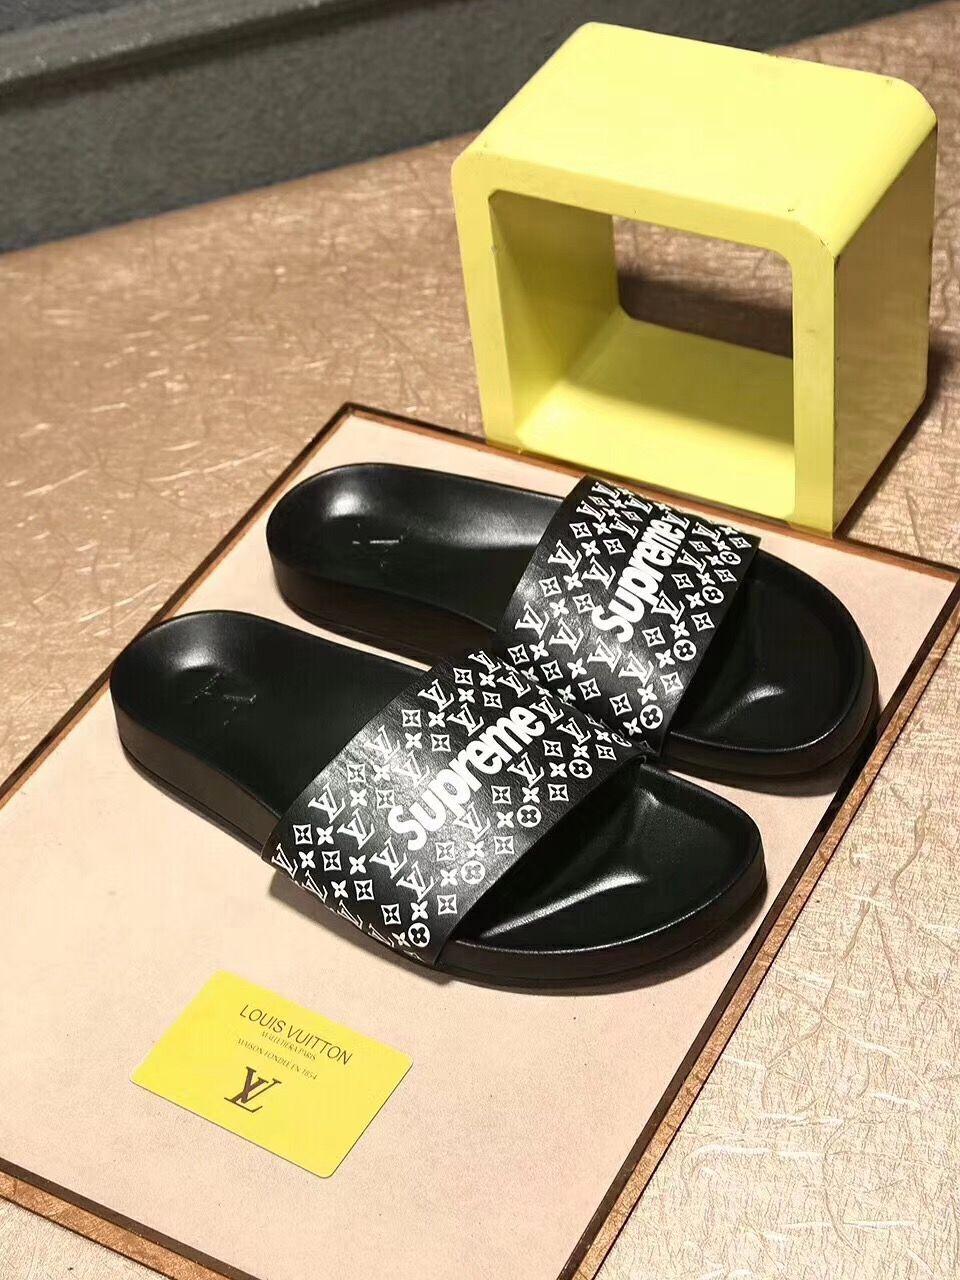 louis vuitton supreme slippers   Louis vuitton, Slippers